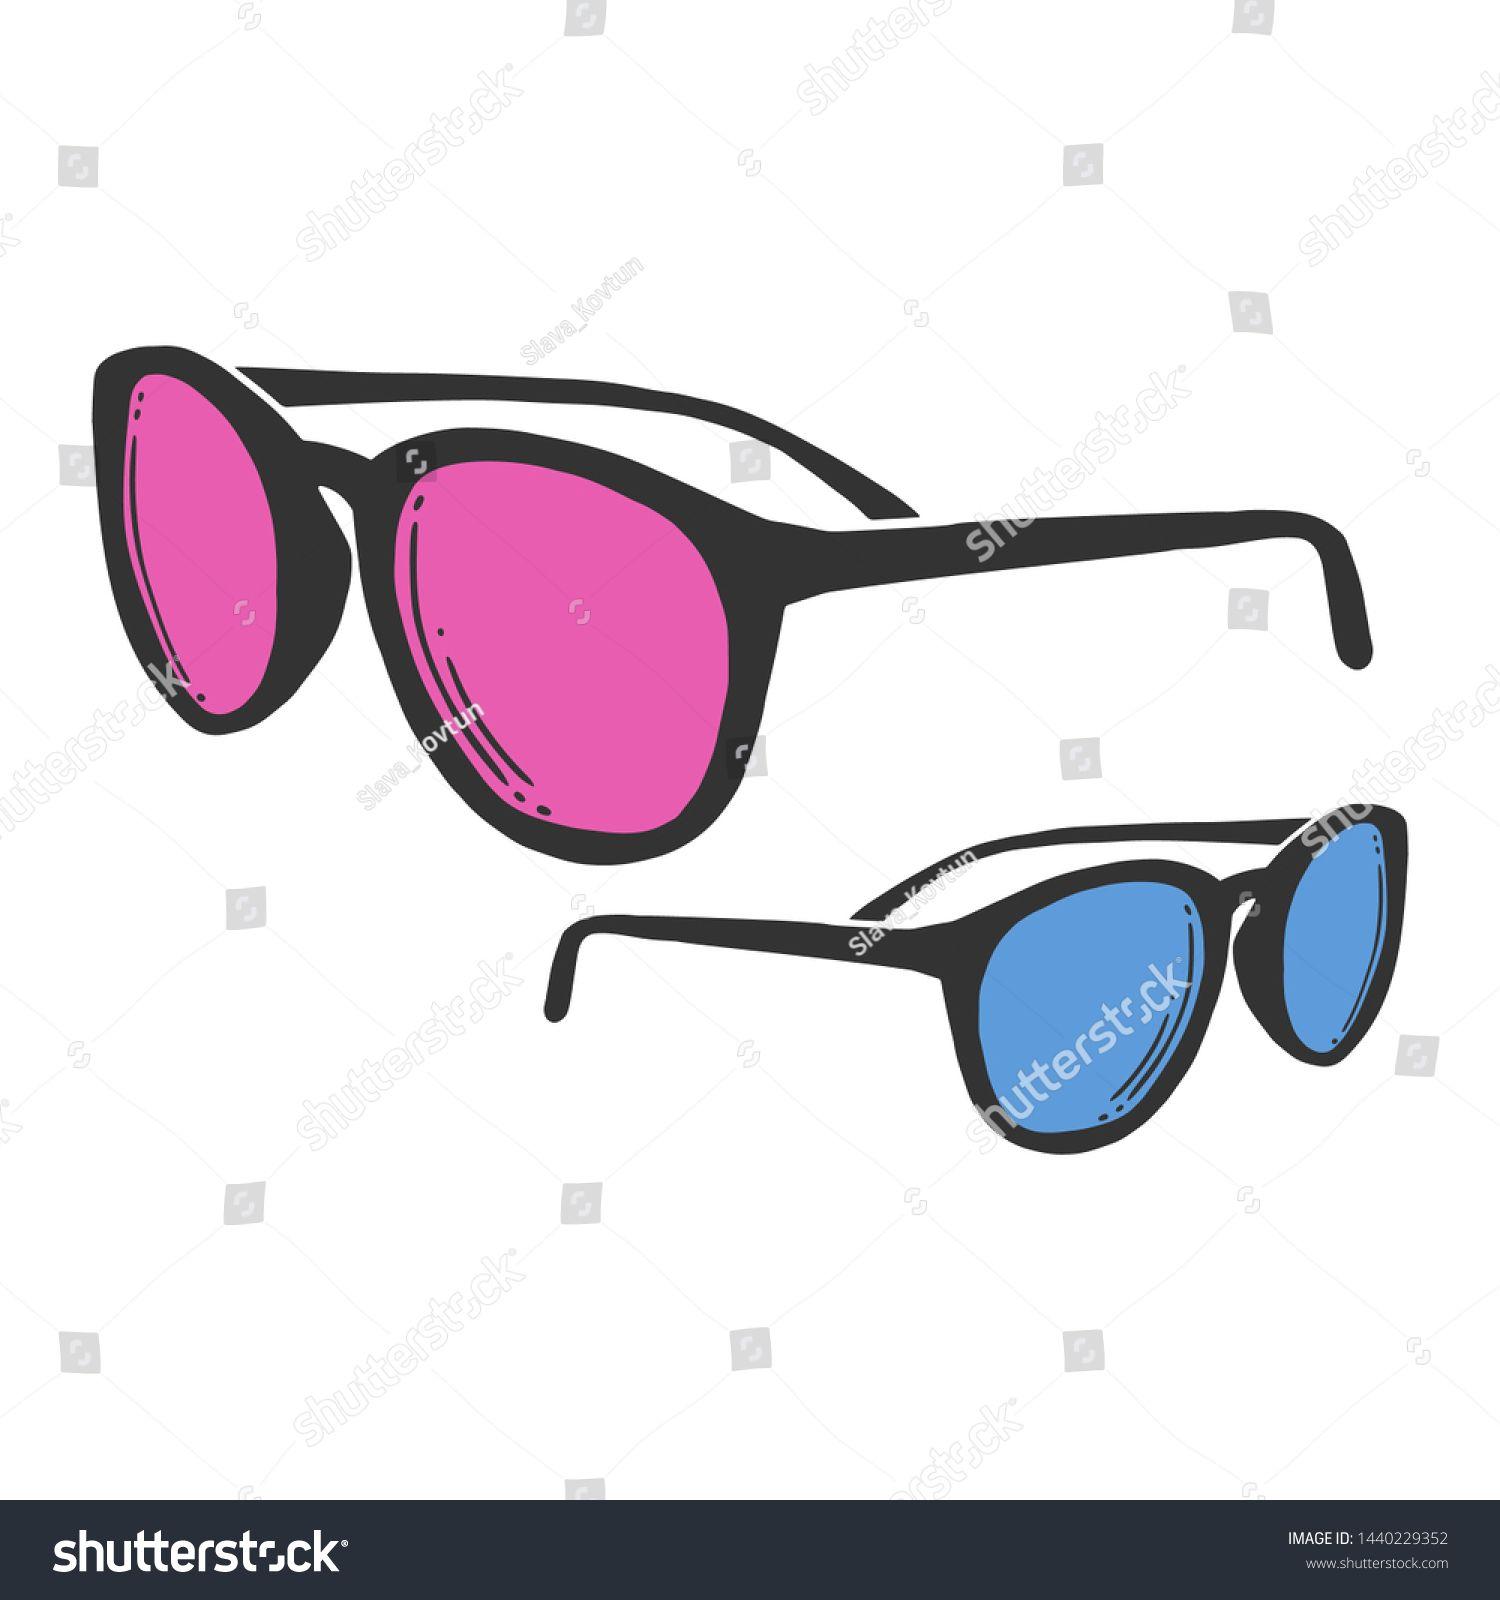 Fashion Sunglasses Vector Concept Doodle Sketch Stock Vector (Royalty Free) 1440229352